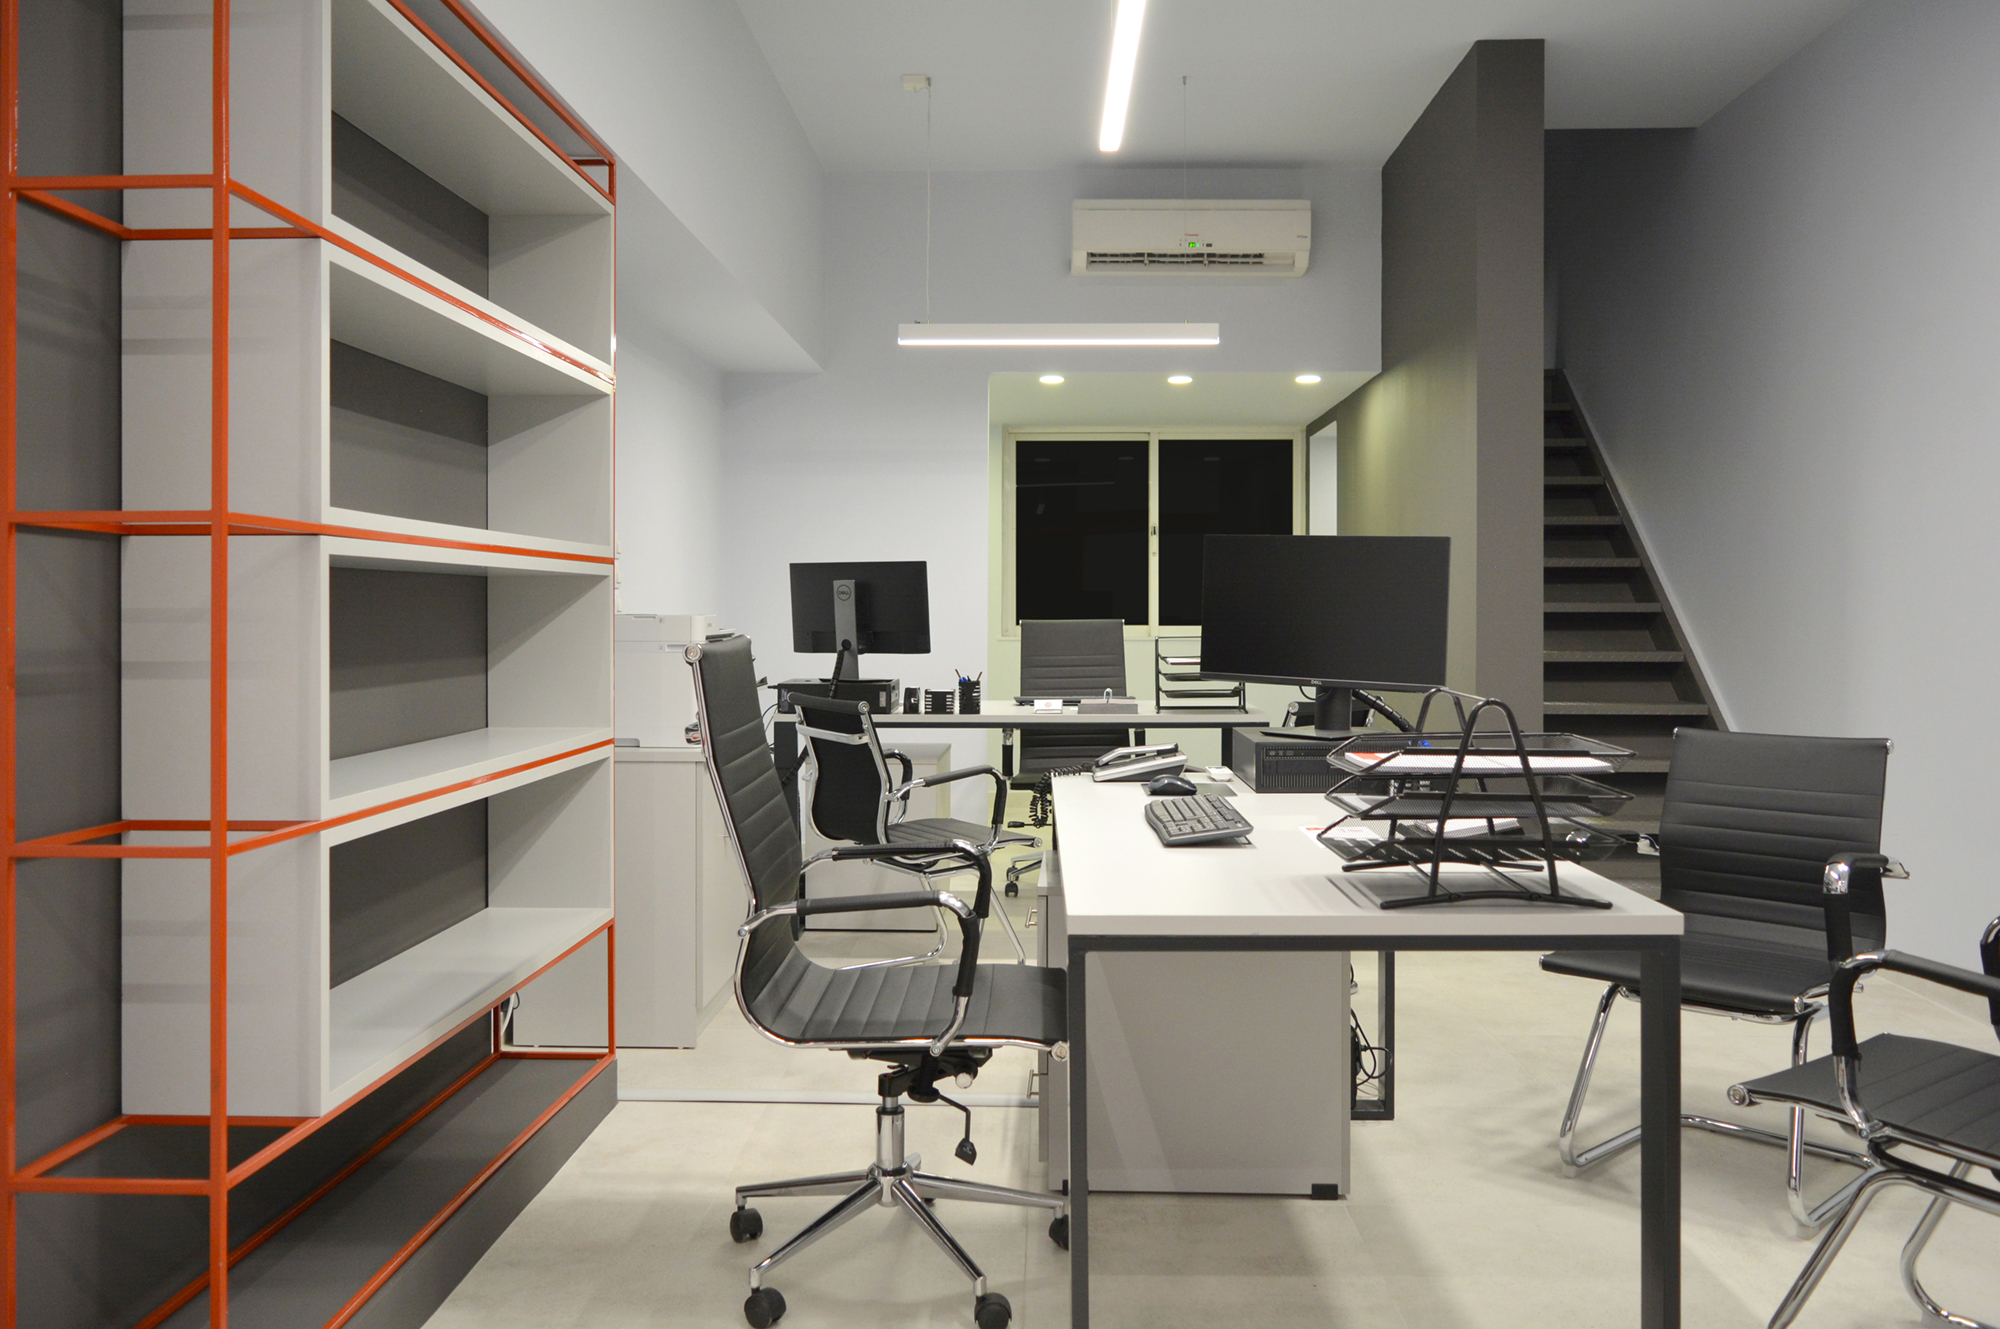 COMPACT interior design